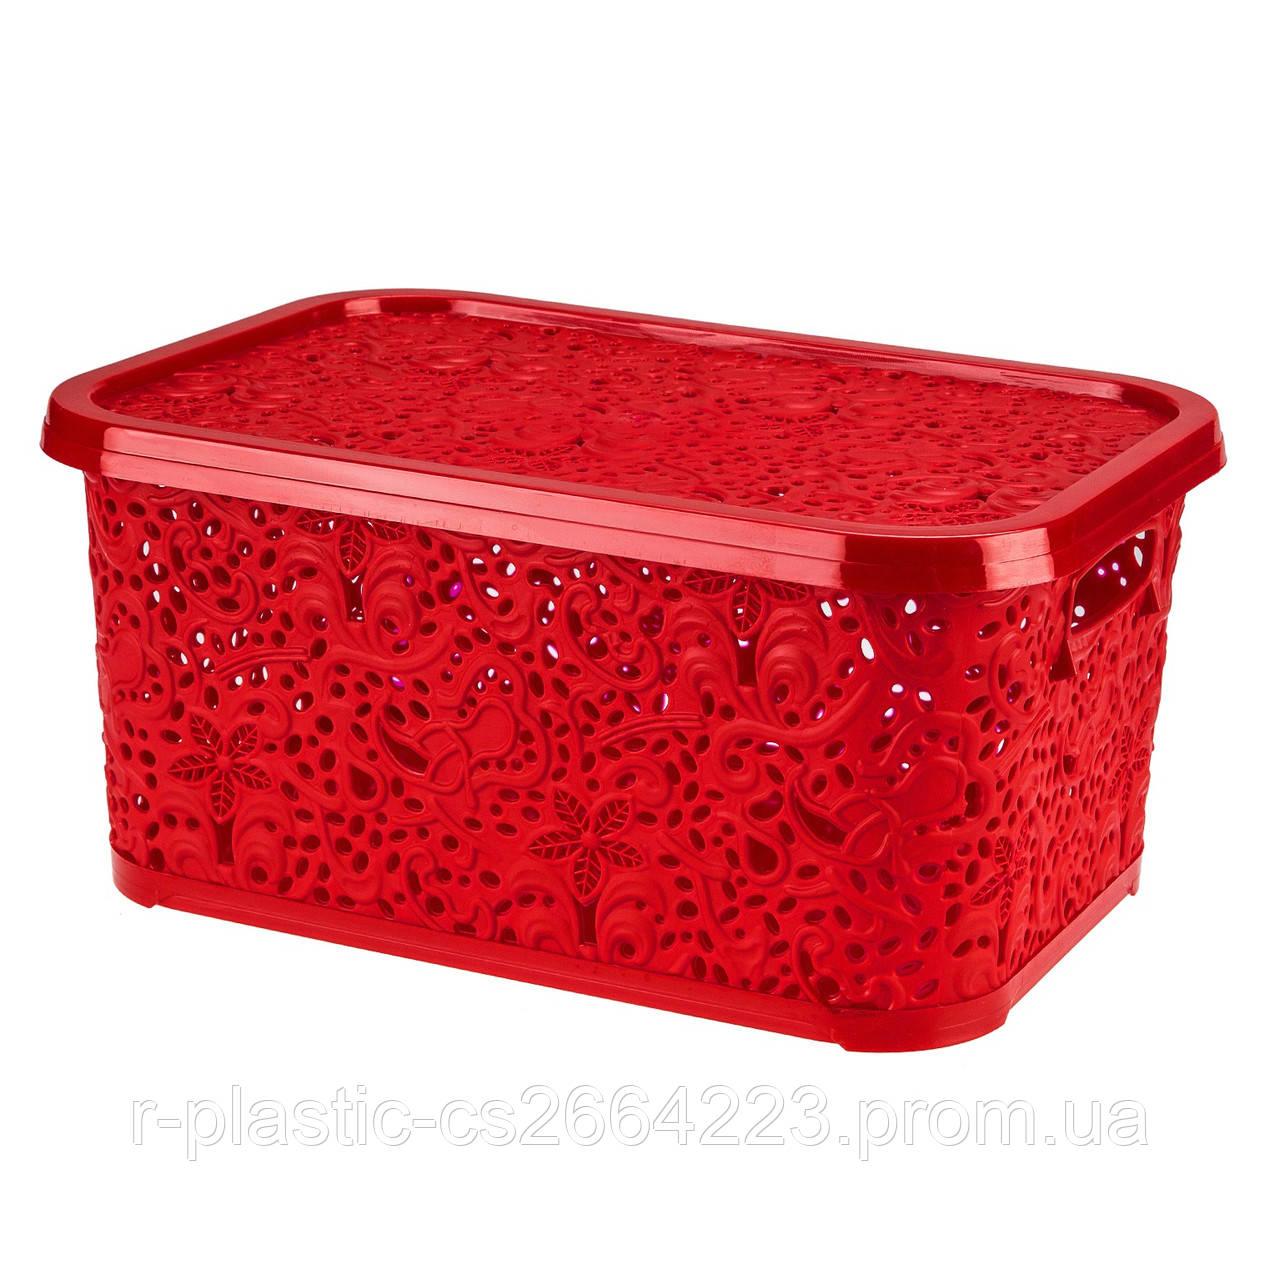 "Корзинка R-Plastic ""Ажур"" 6л 28,5*20,5*12,5см красная"